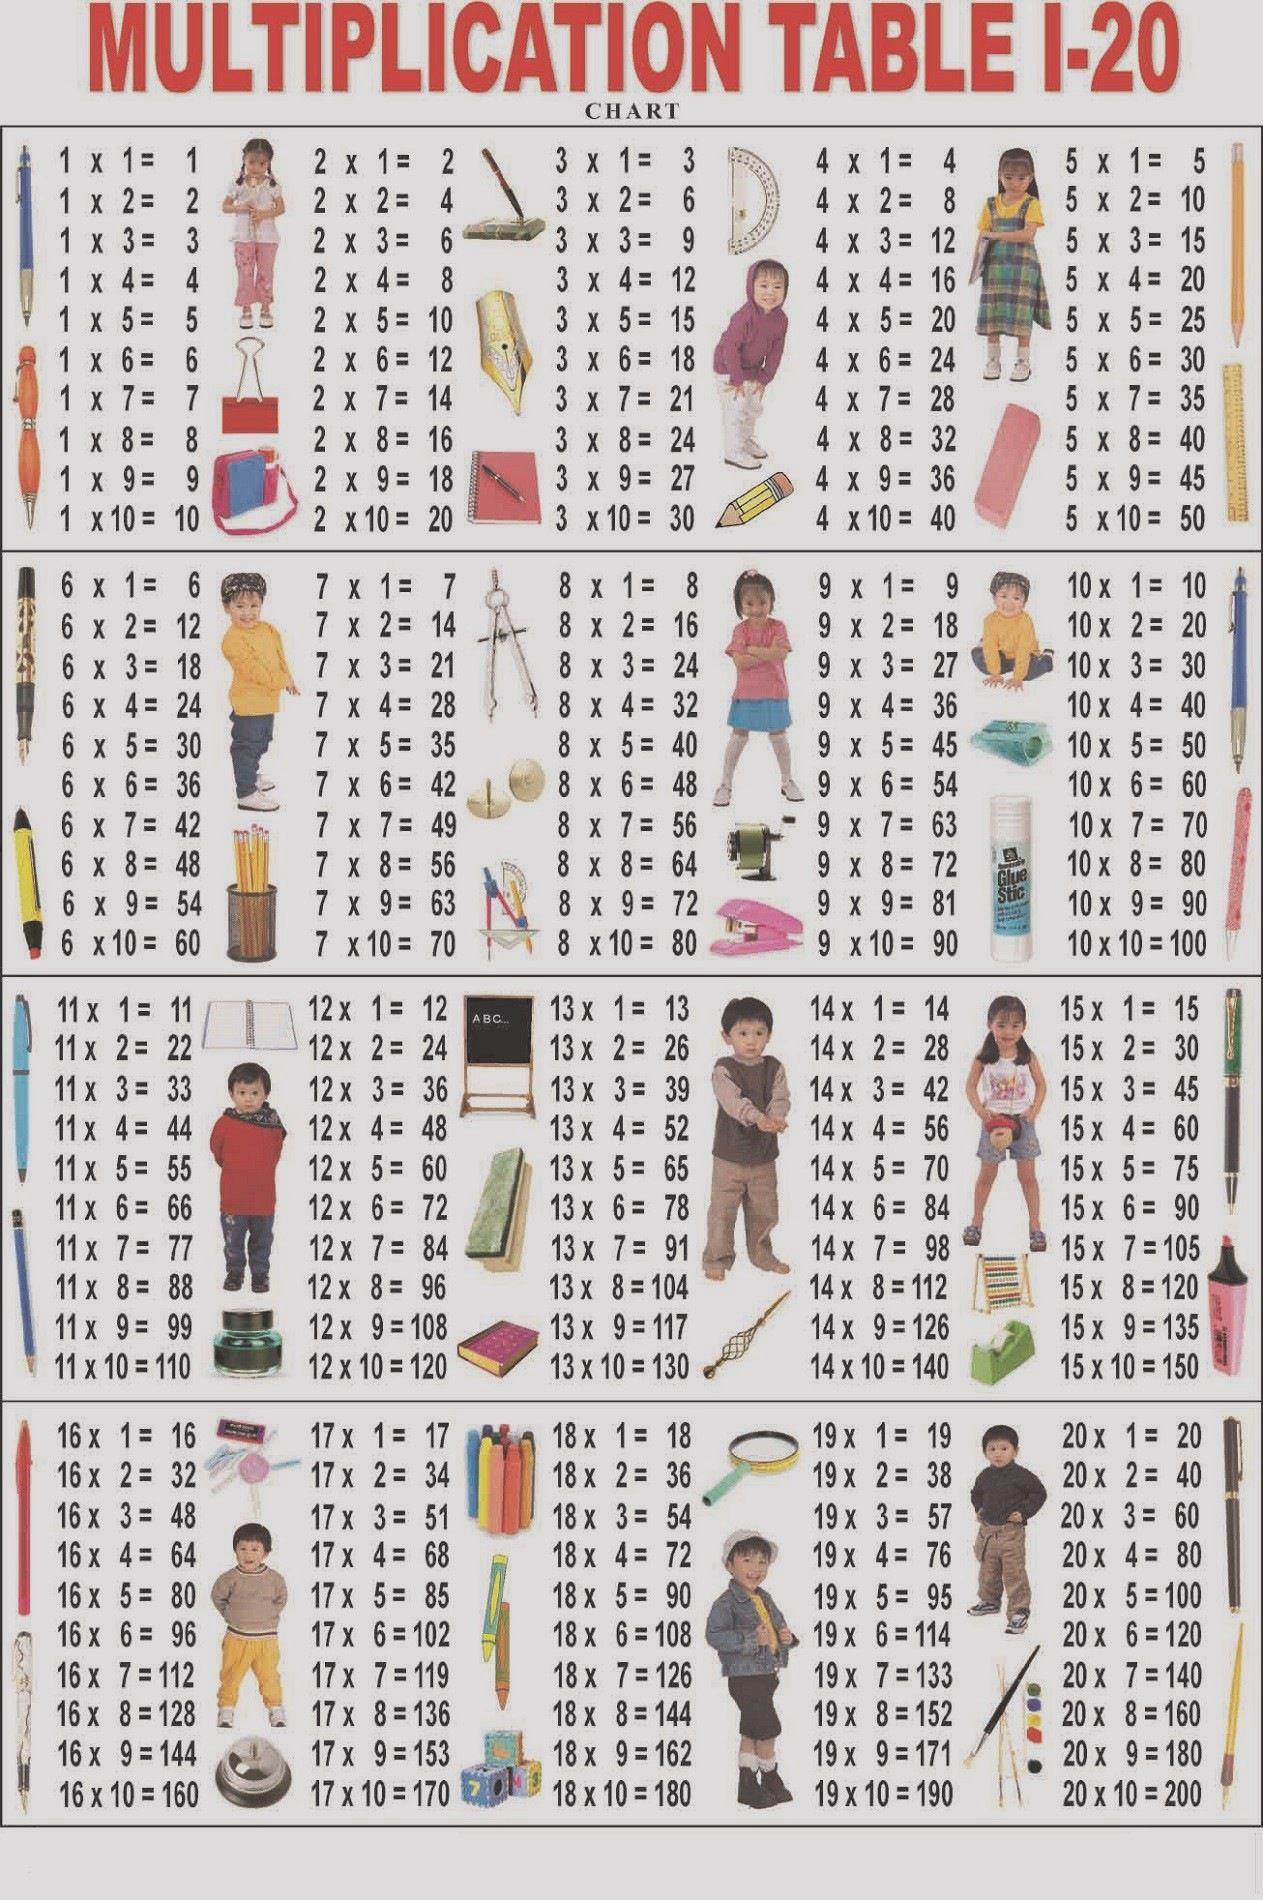 99 La Table De Multiplication Check More At S